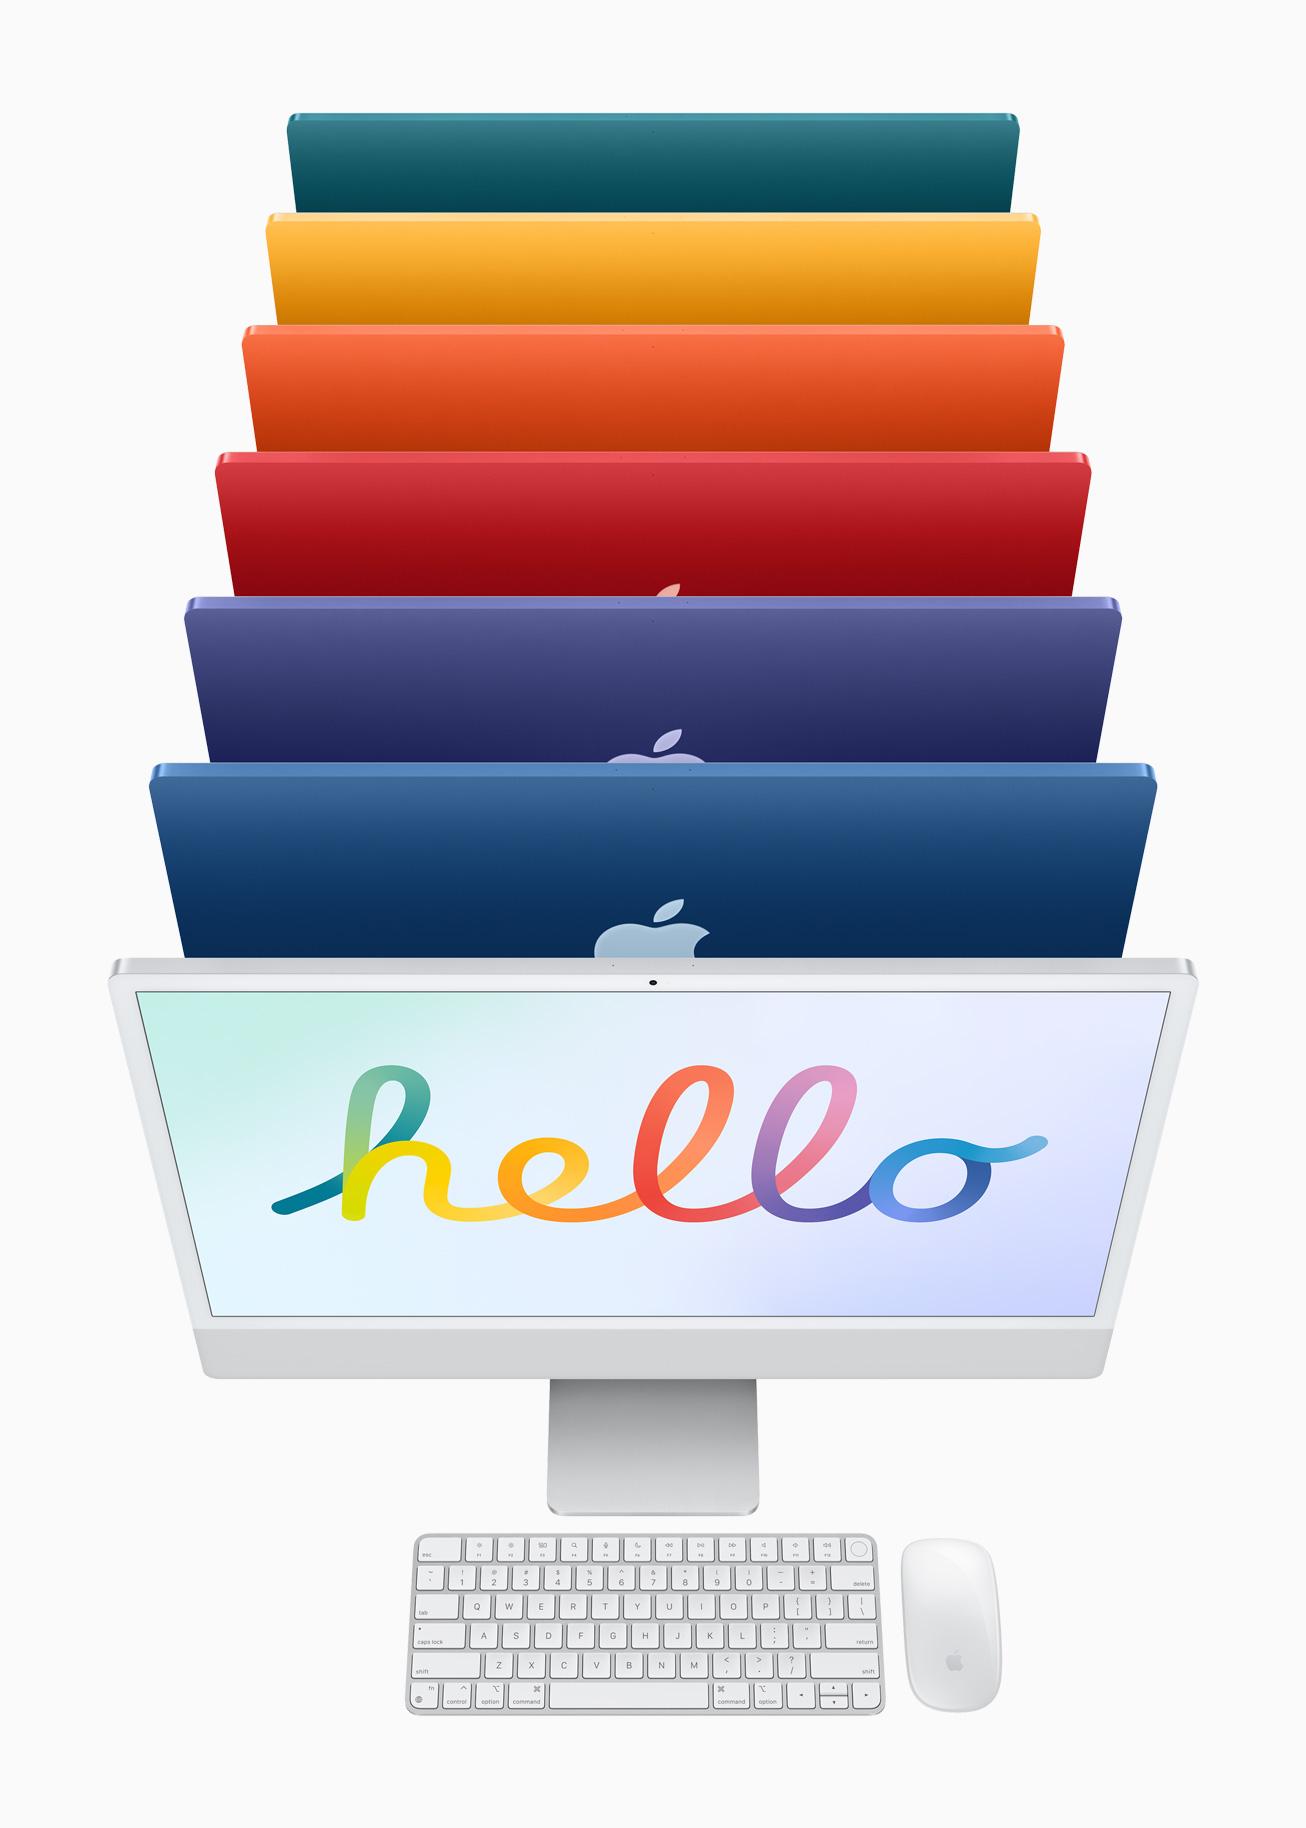 To Spring Event της Apple φέρνει το ουράνιο τόξο στα iMac